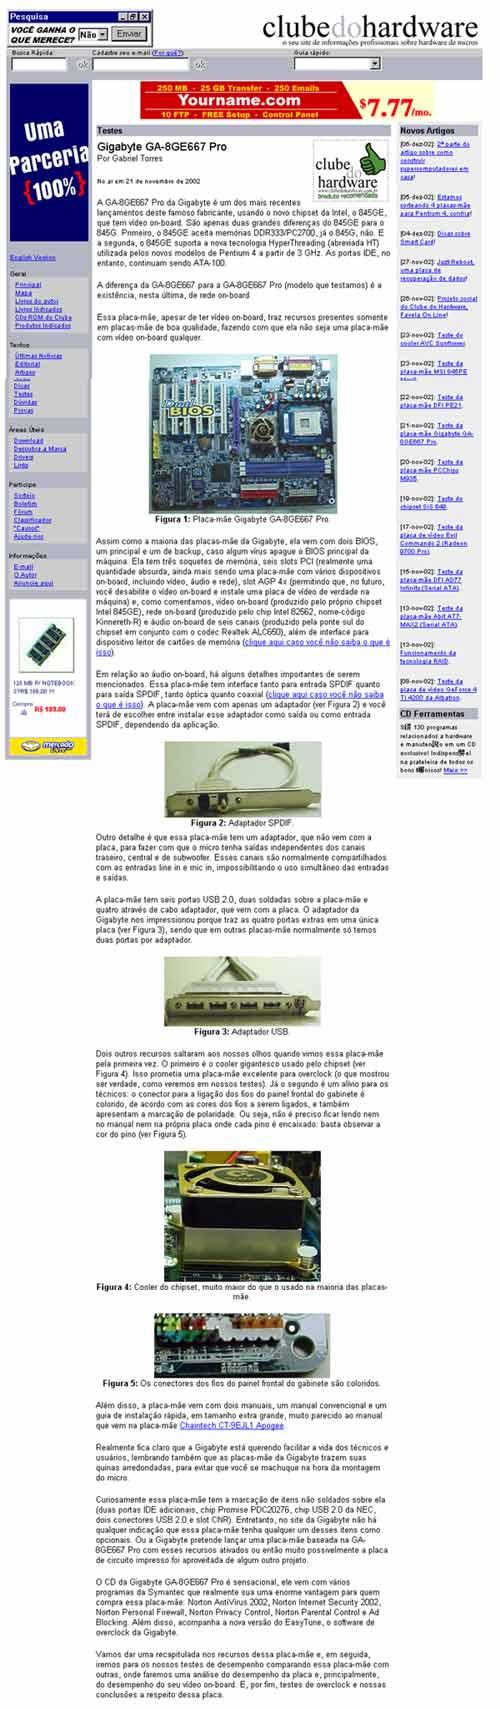 Gigabyte GA-8GE667 F5 Driver for Windows Mac